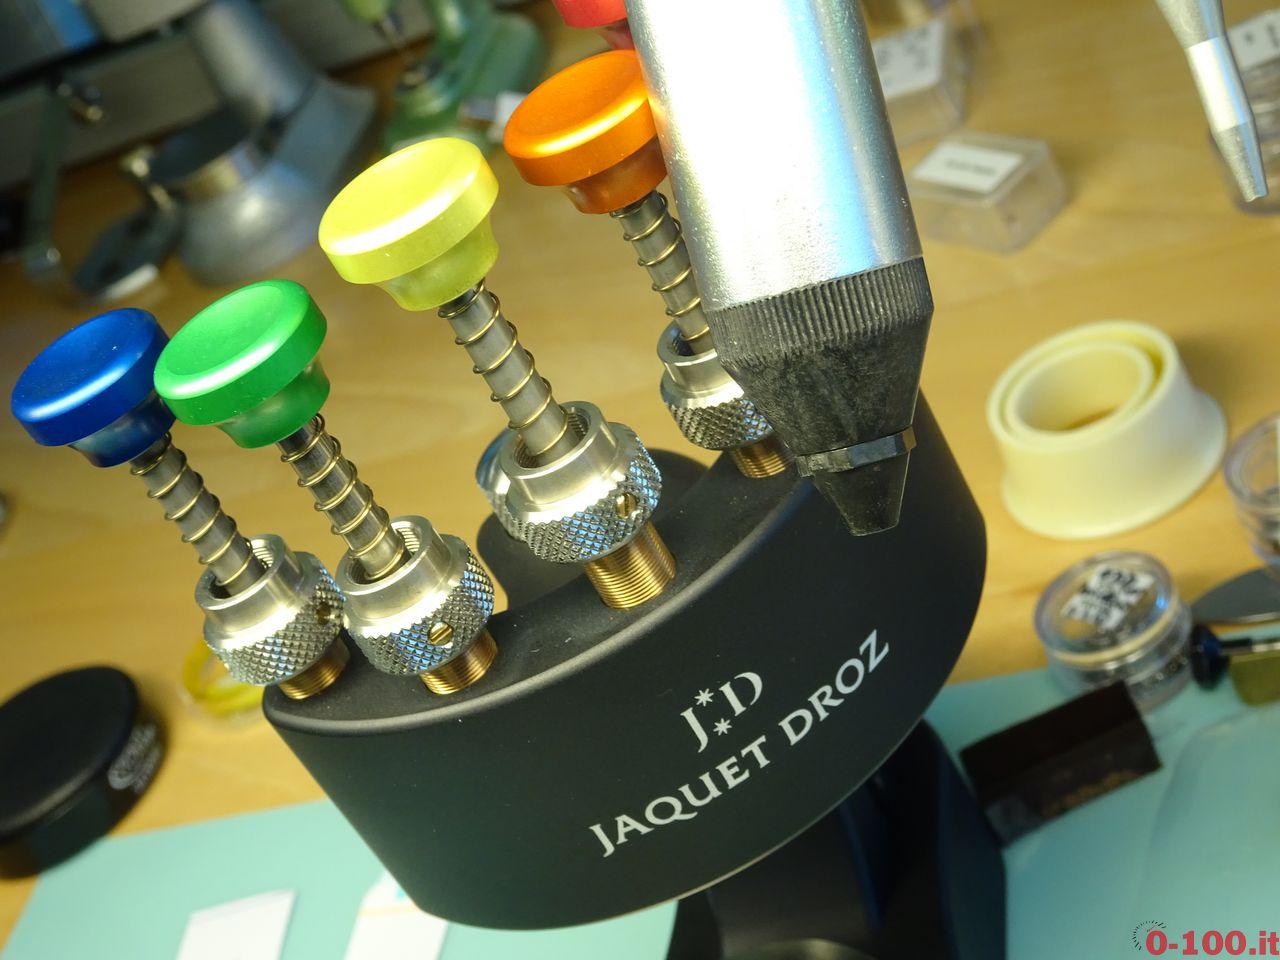 gli-speciali-di-0-100-it-jaquet-droz-la-manifattura-di-la-chaux-de-fonds_0-10053